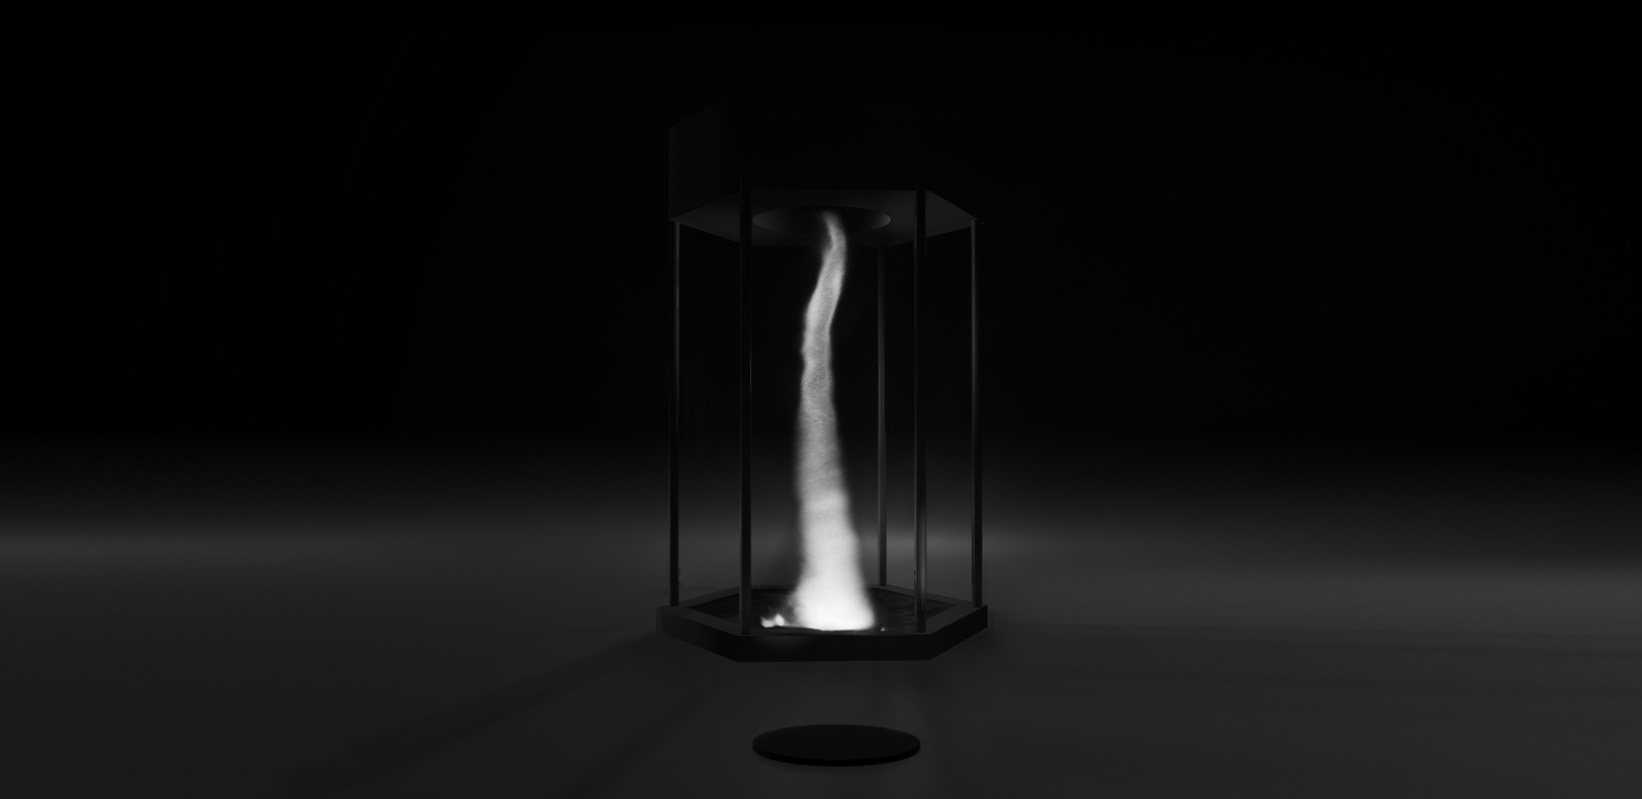 Copy of Render-Tornado-07-02